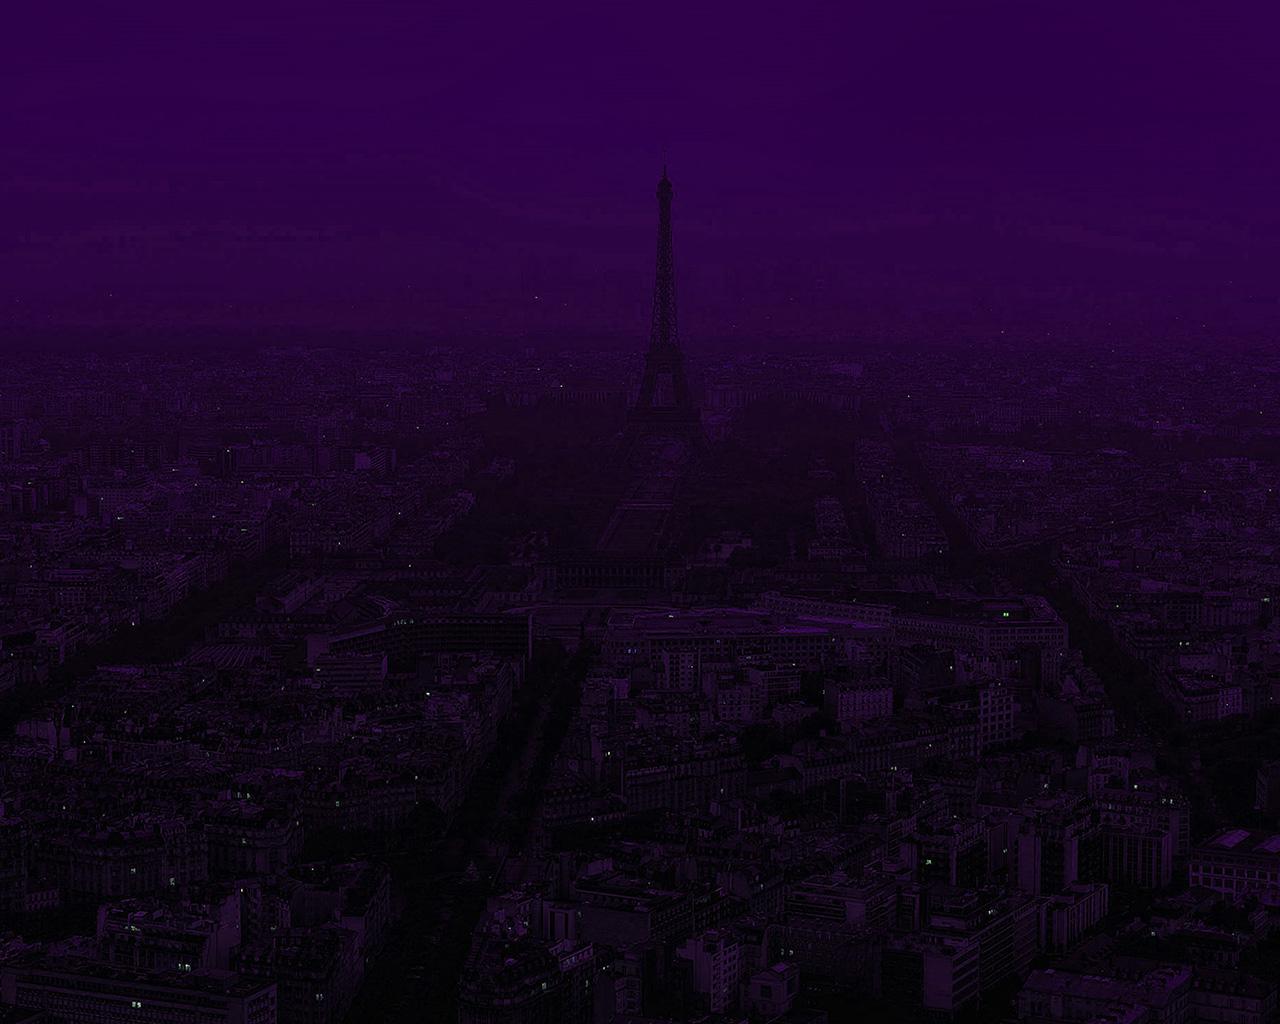 wallpaper for desktop, laptop   bb43-paris-dark-purple ...